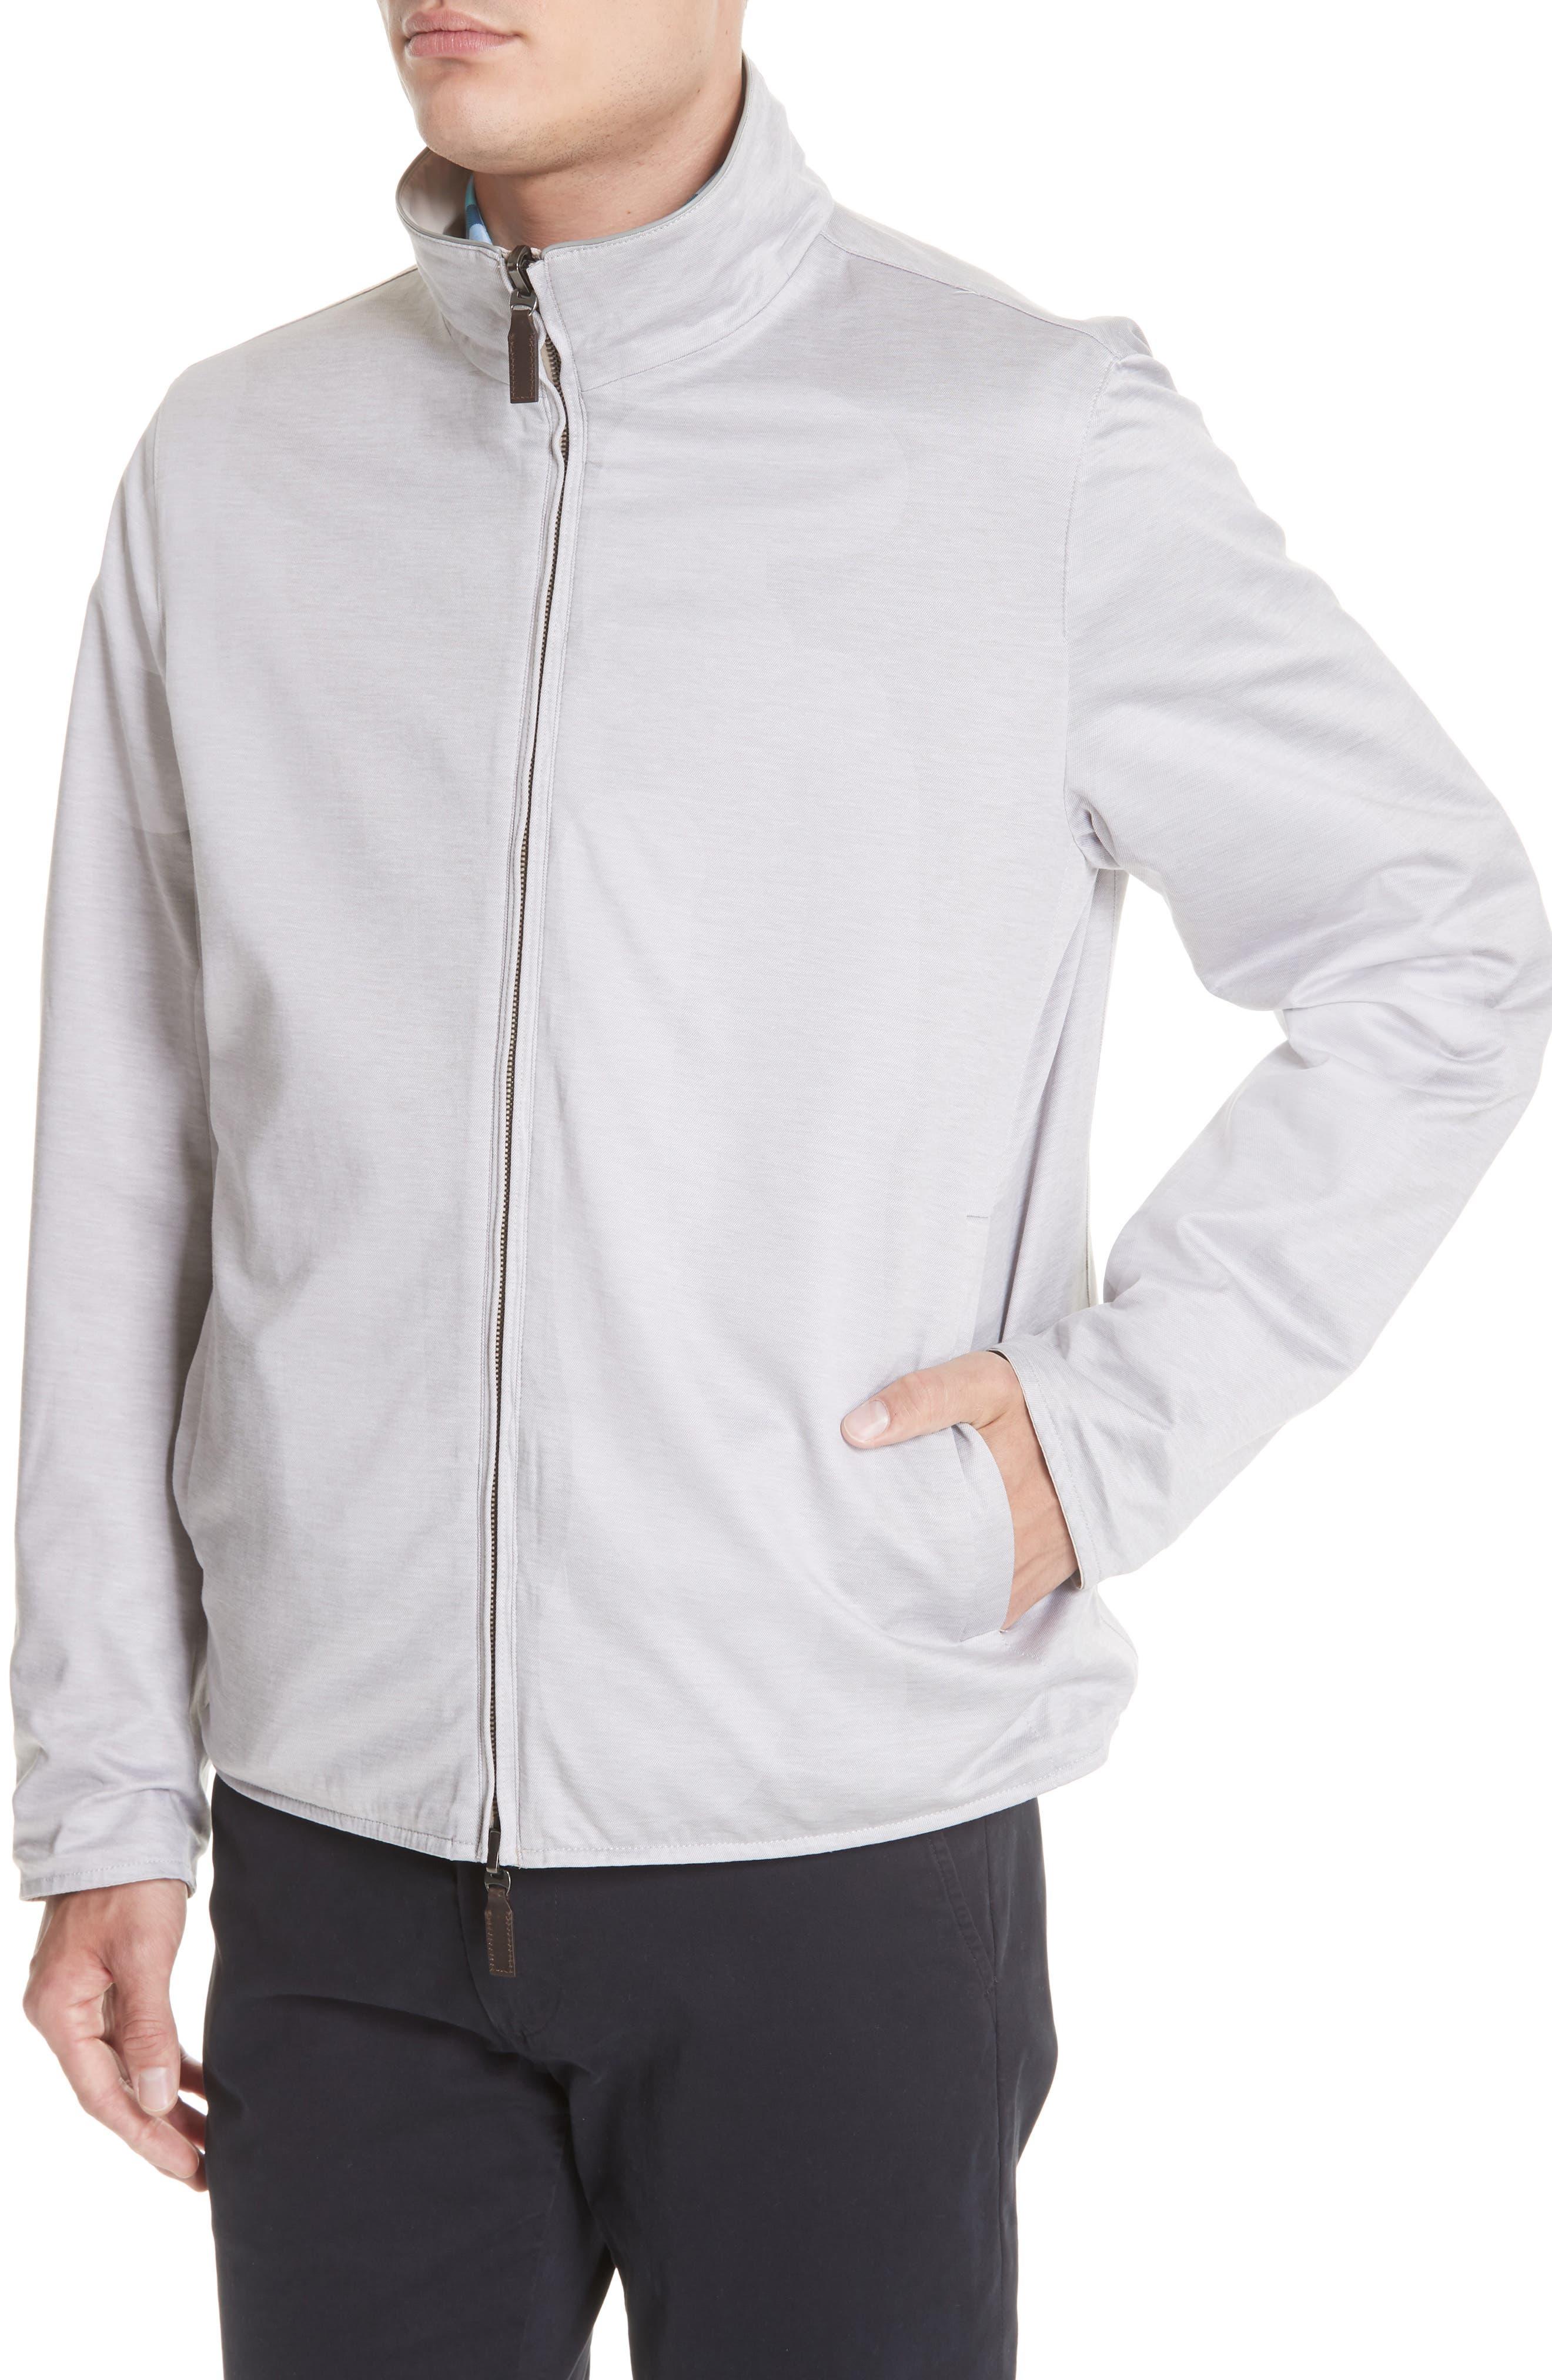 Regular Fit Cotton Jacket,                             Alternate thumbnail 2, color,